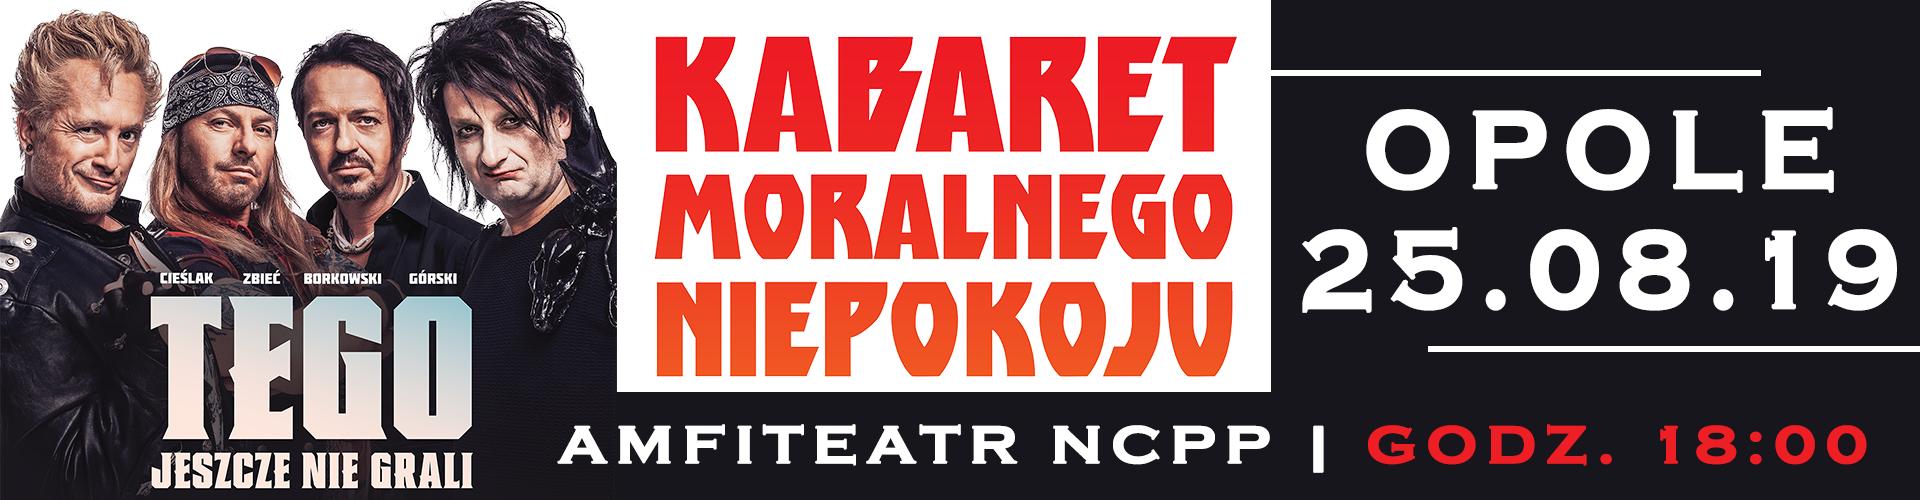 Slider NCPP